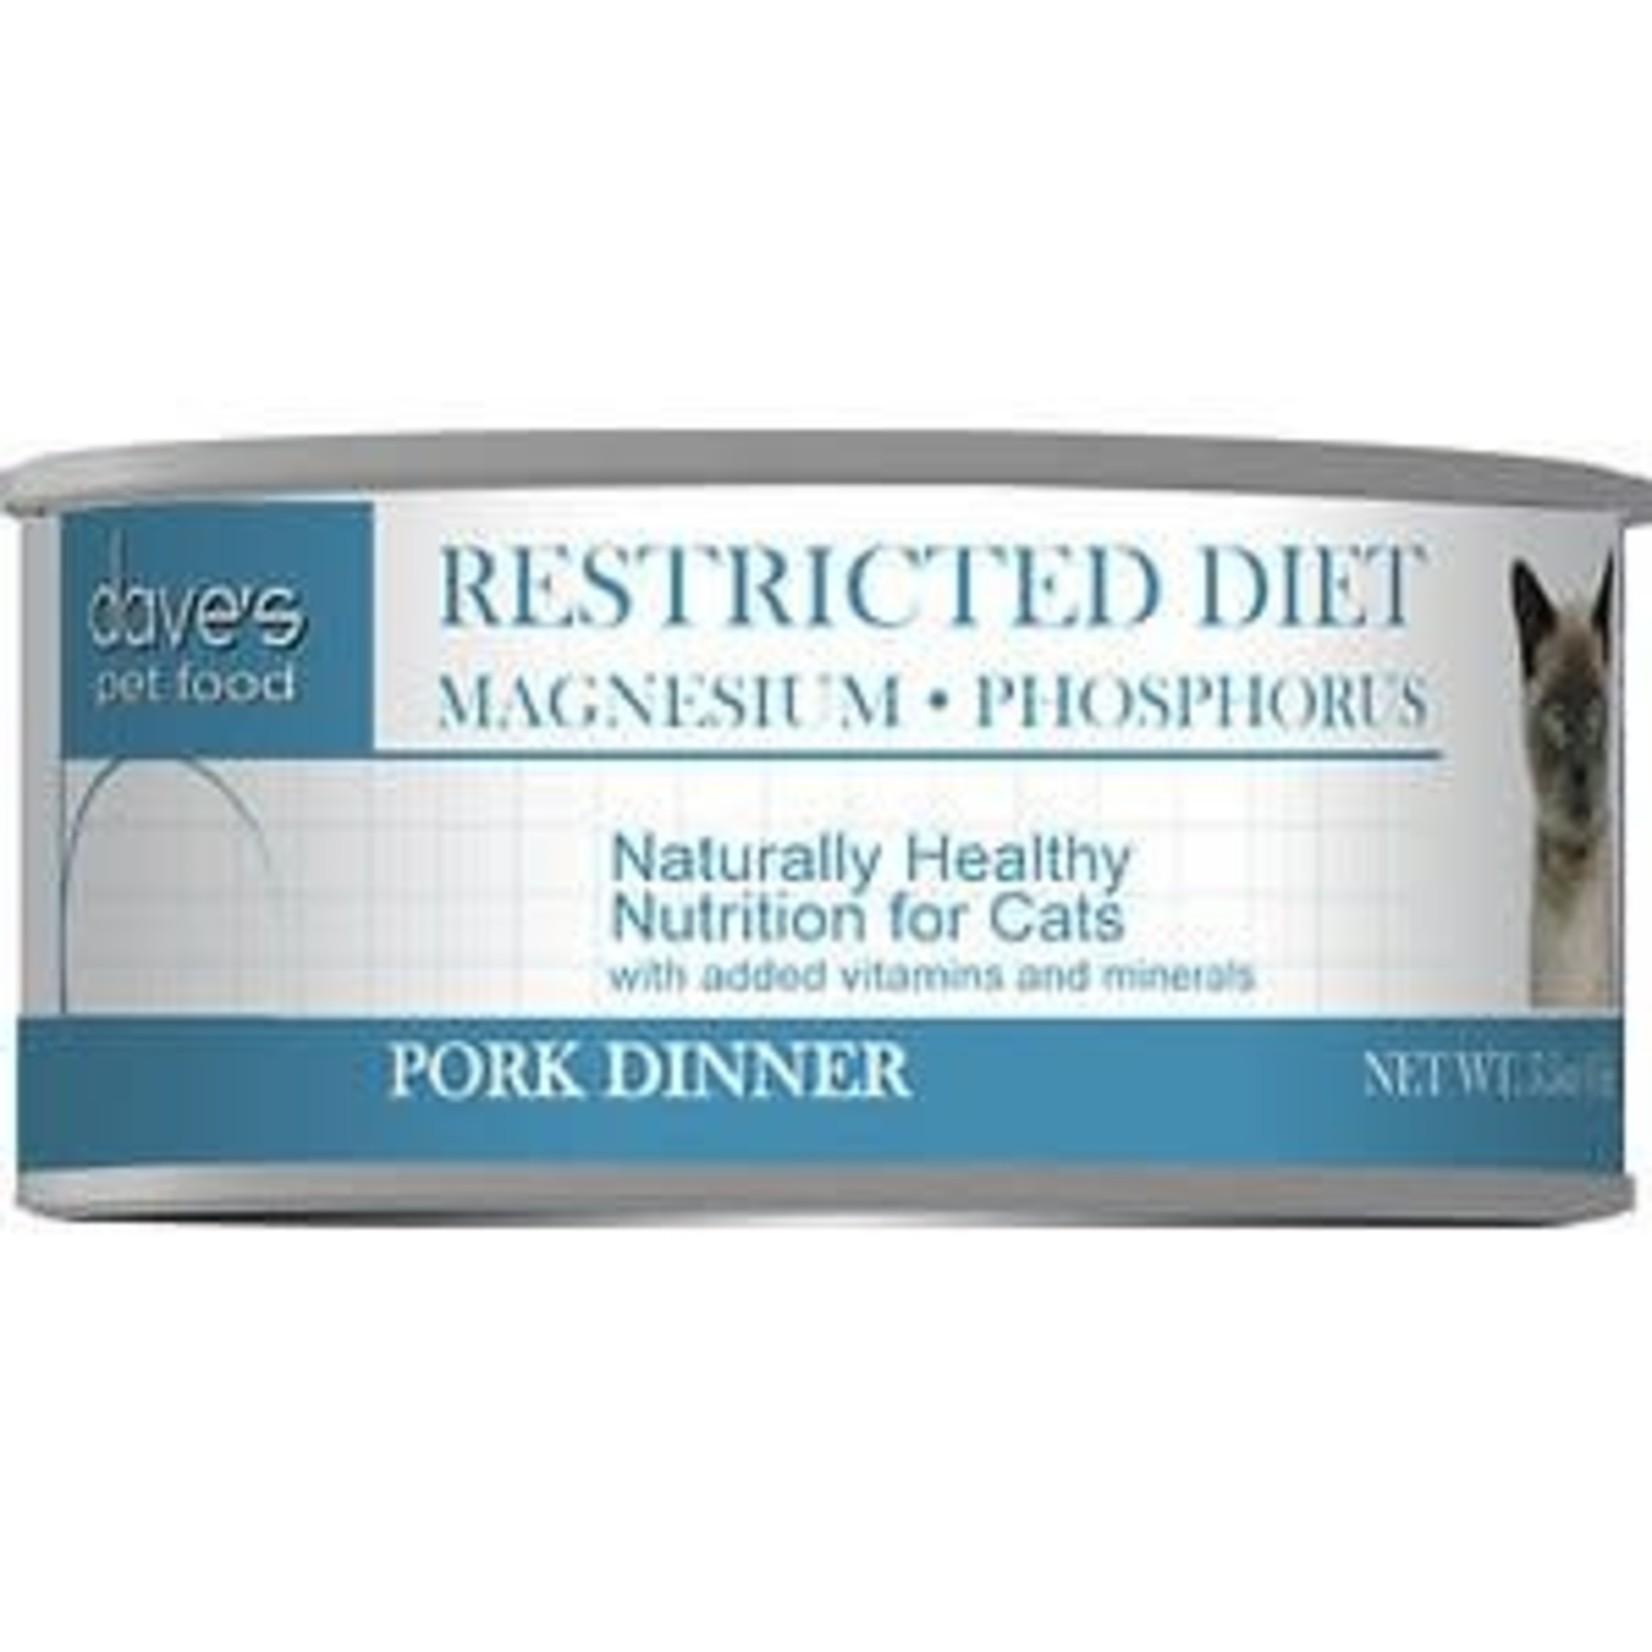 Dave's Pet Food Dave's Restricted Diet Magnesium & Phosphorus Pork Canned Cat Food 5.5oz